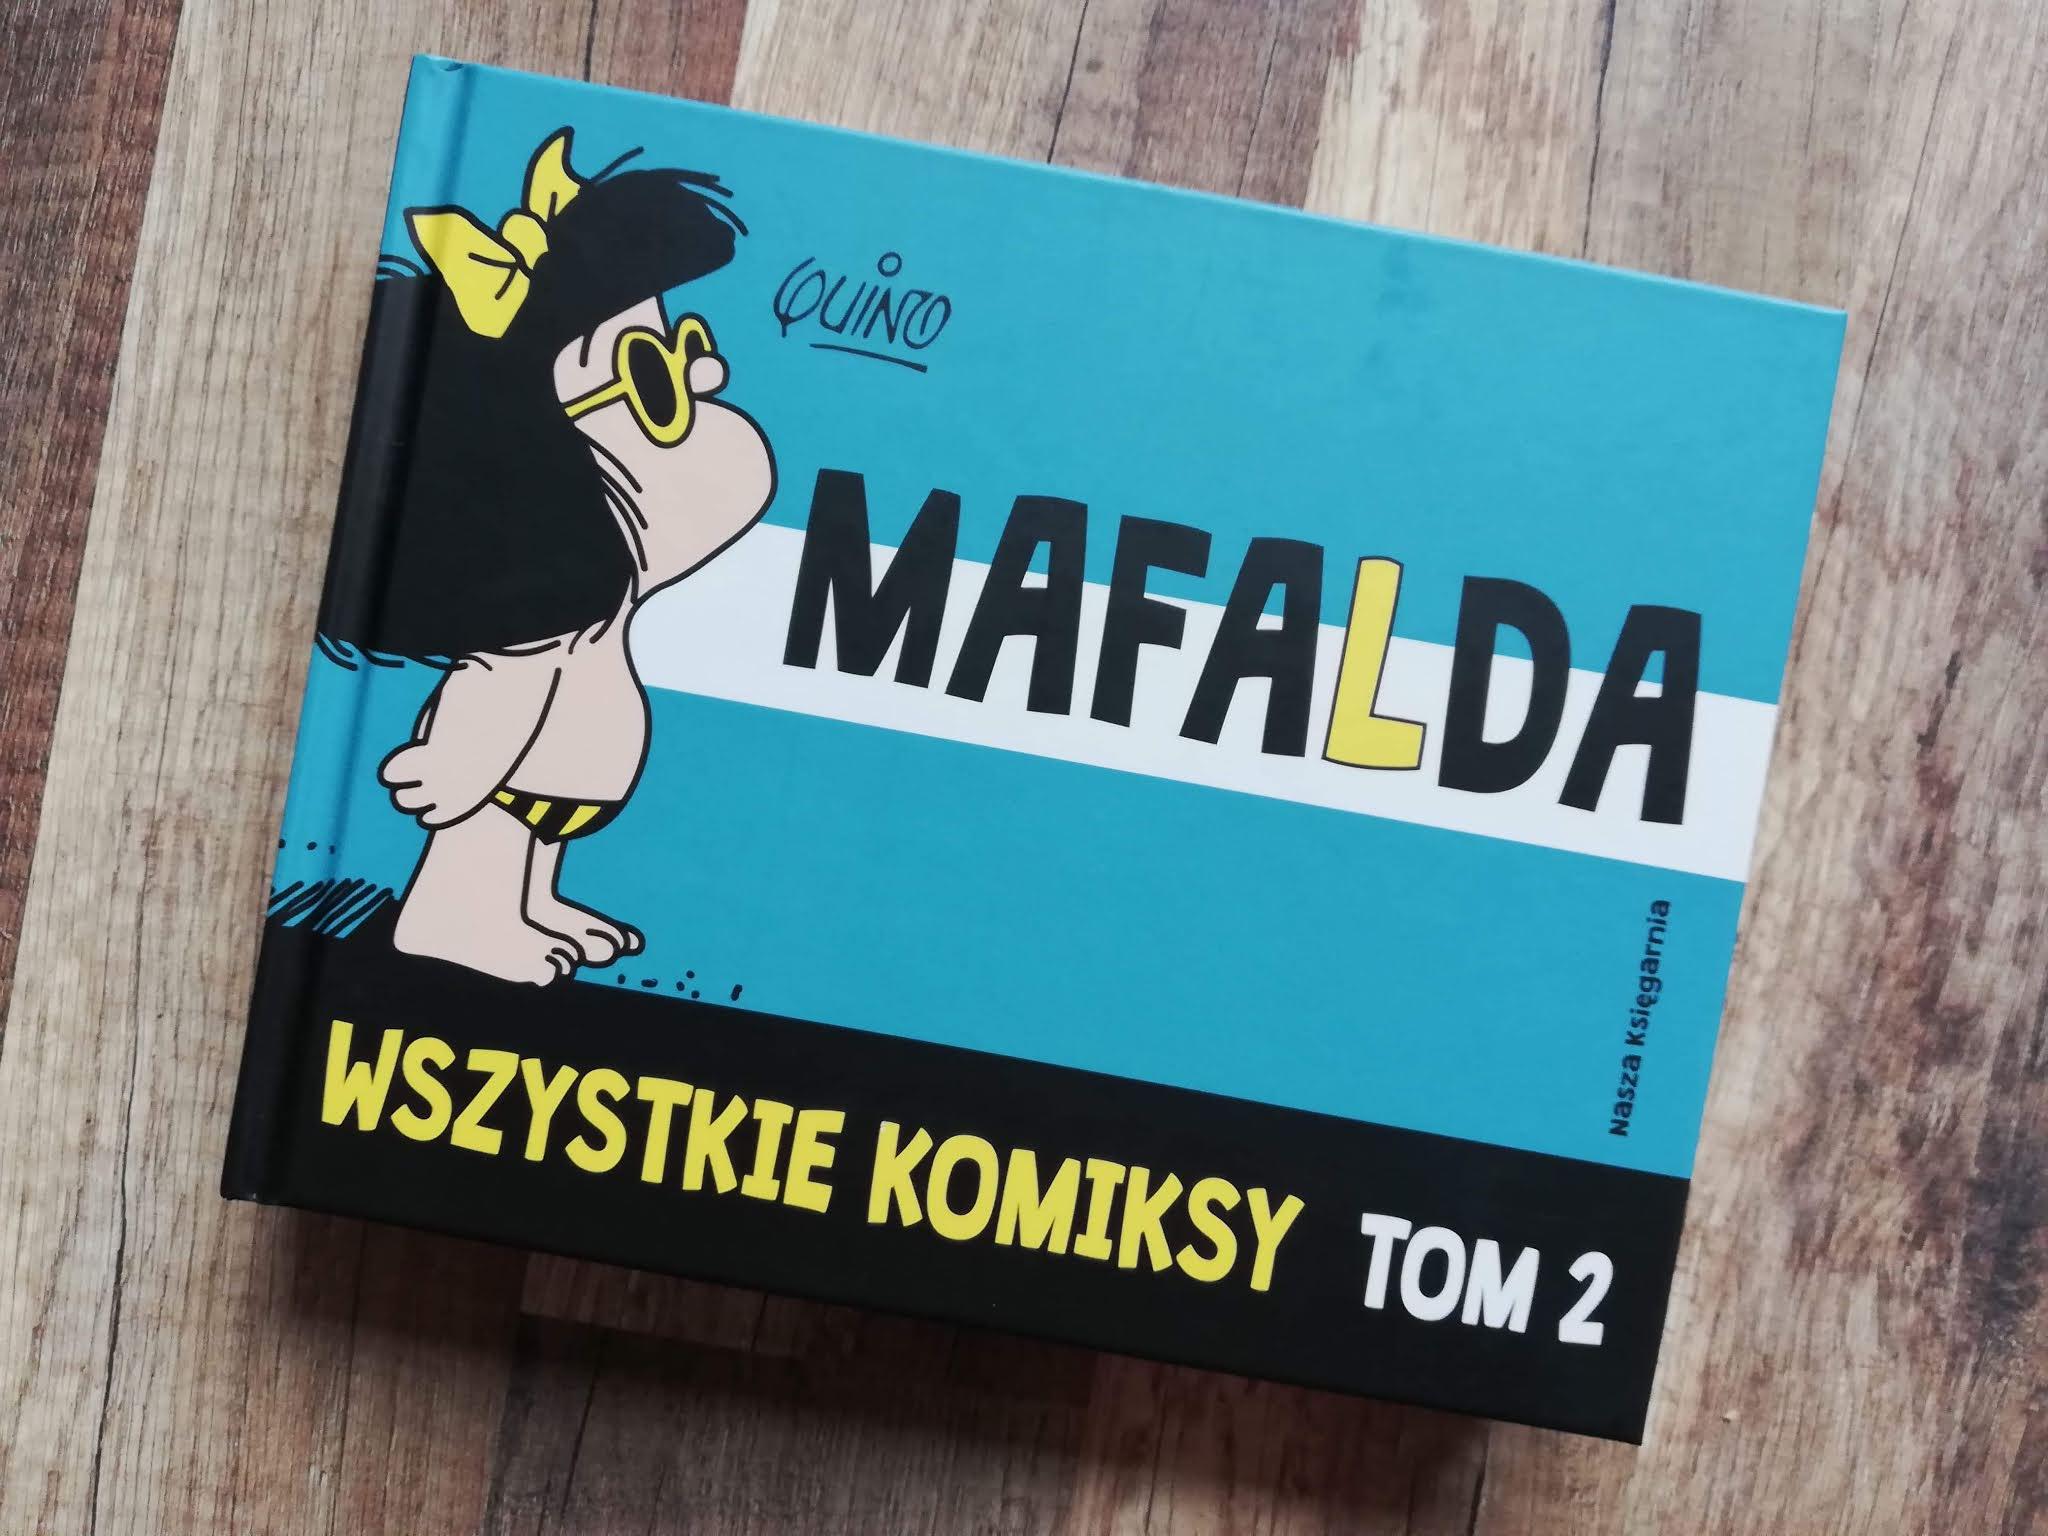 Mafalda komiks